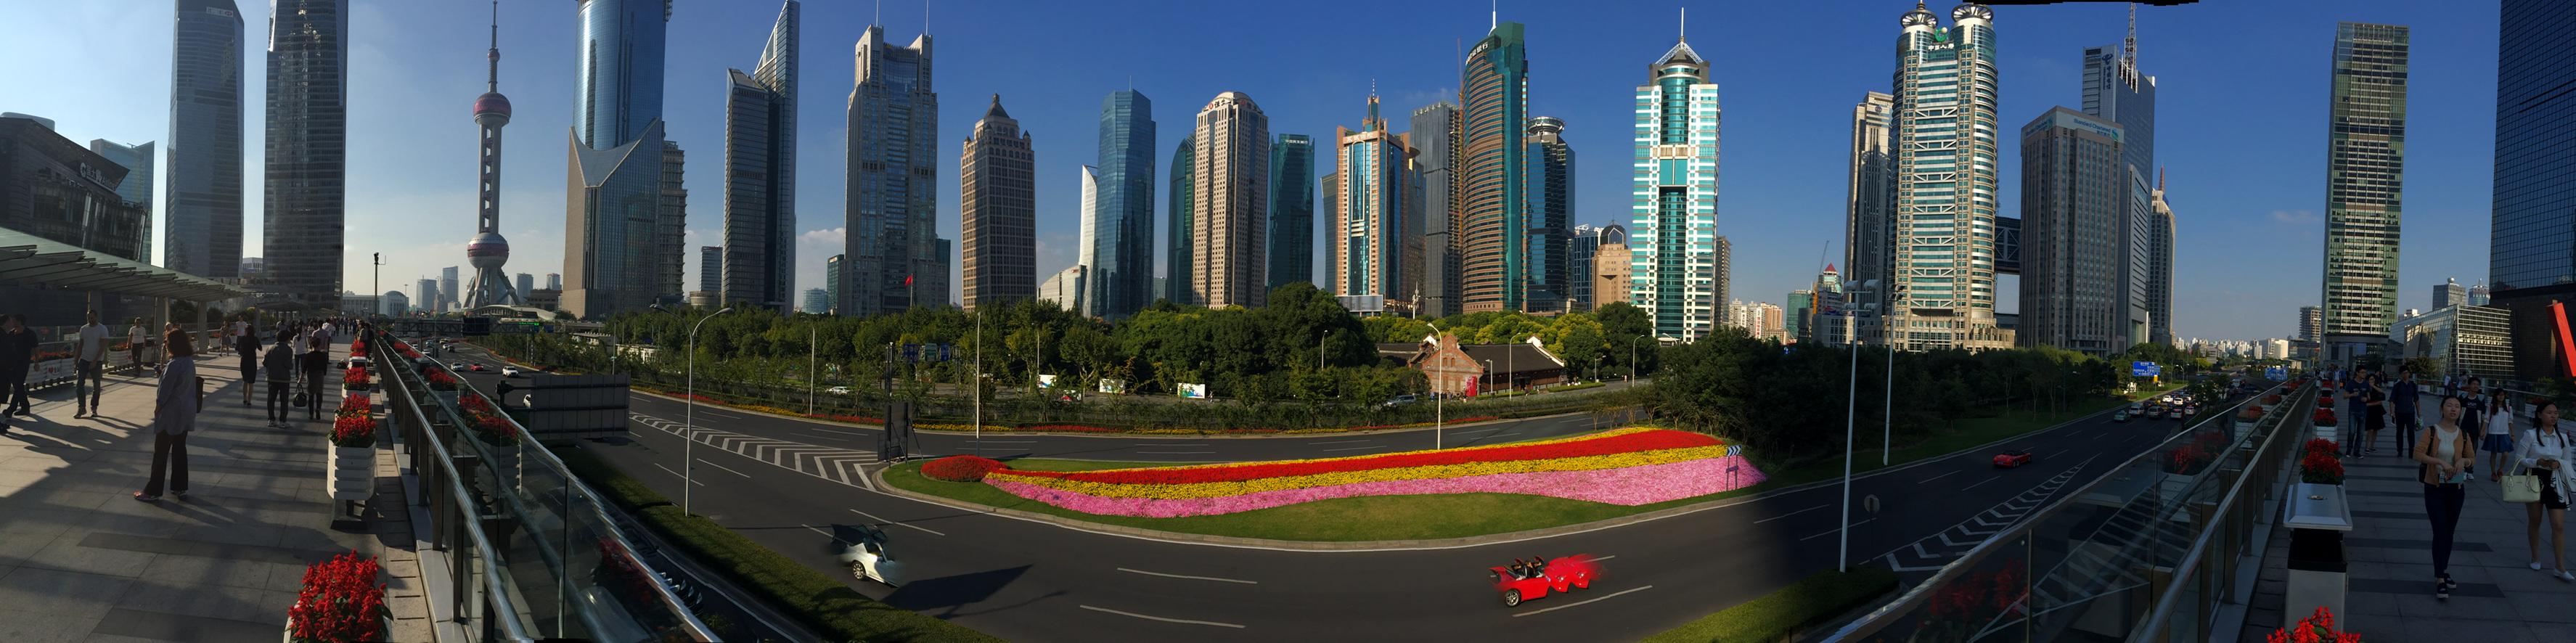 CAPAStudyAbroad_Shanghai_Fall2015_From_John_Christian_-_skyline.jpg